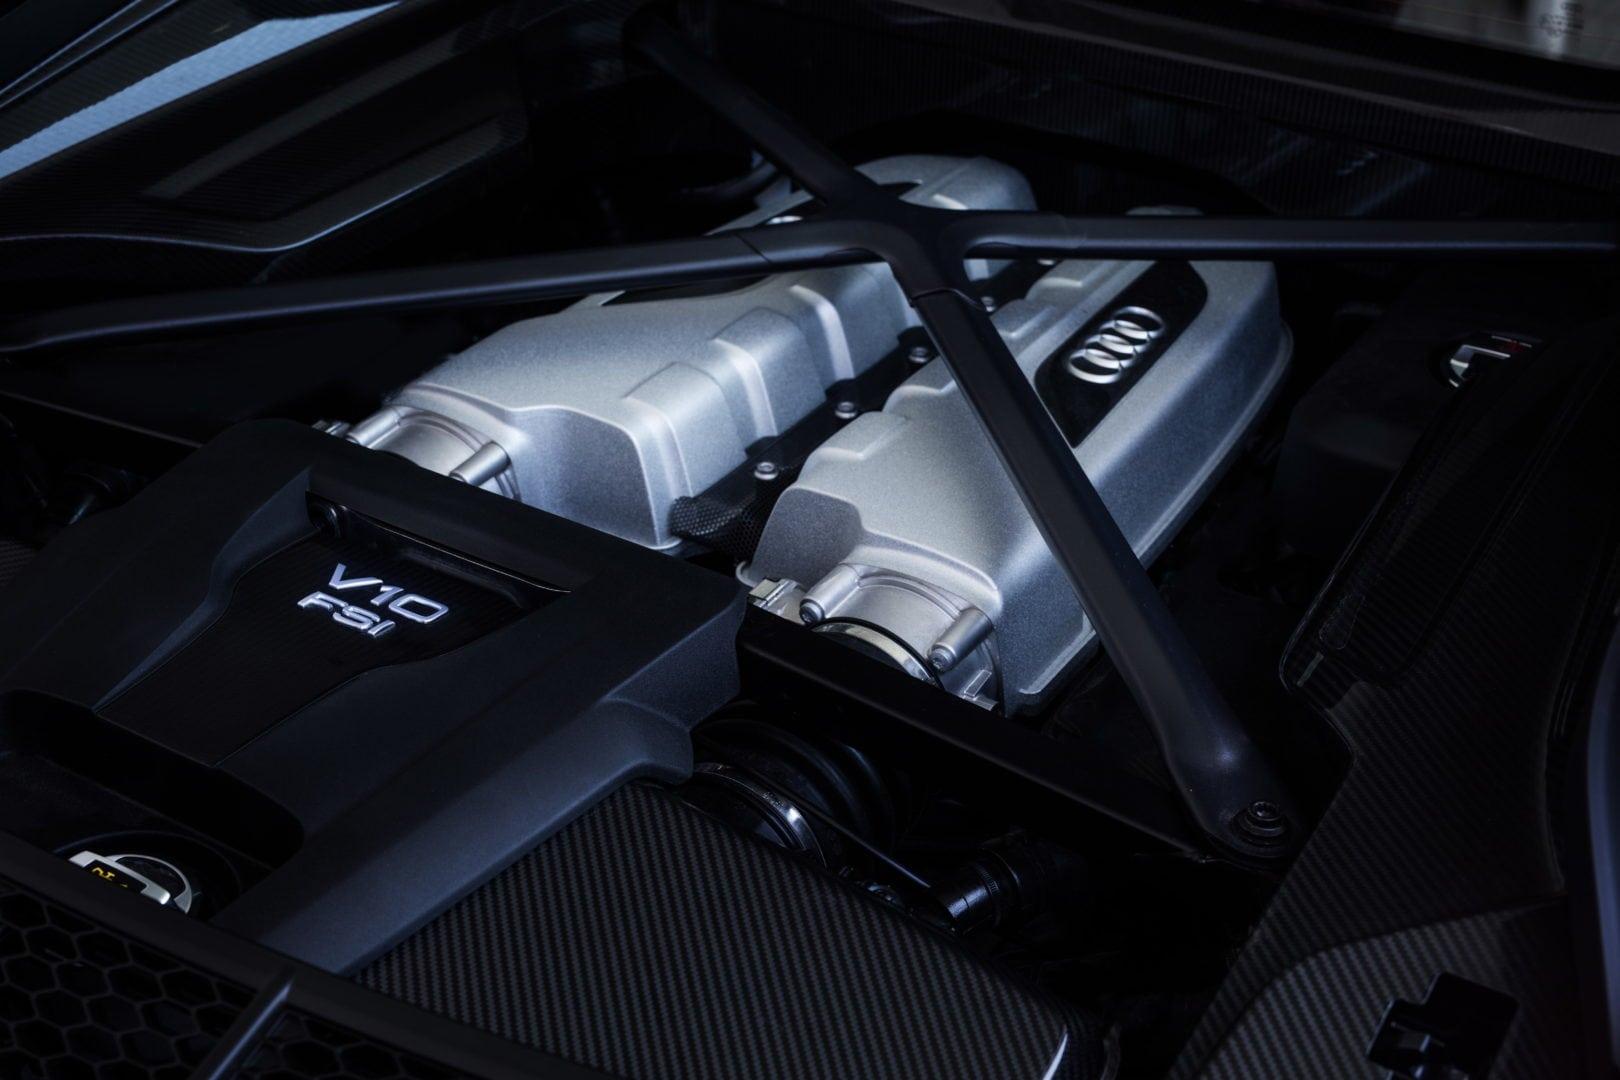 2016 R8 engine